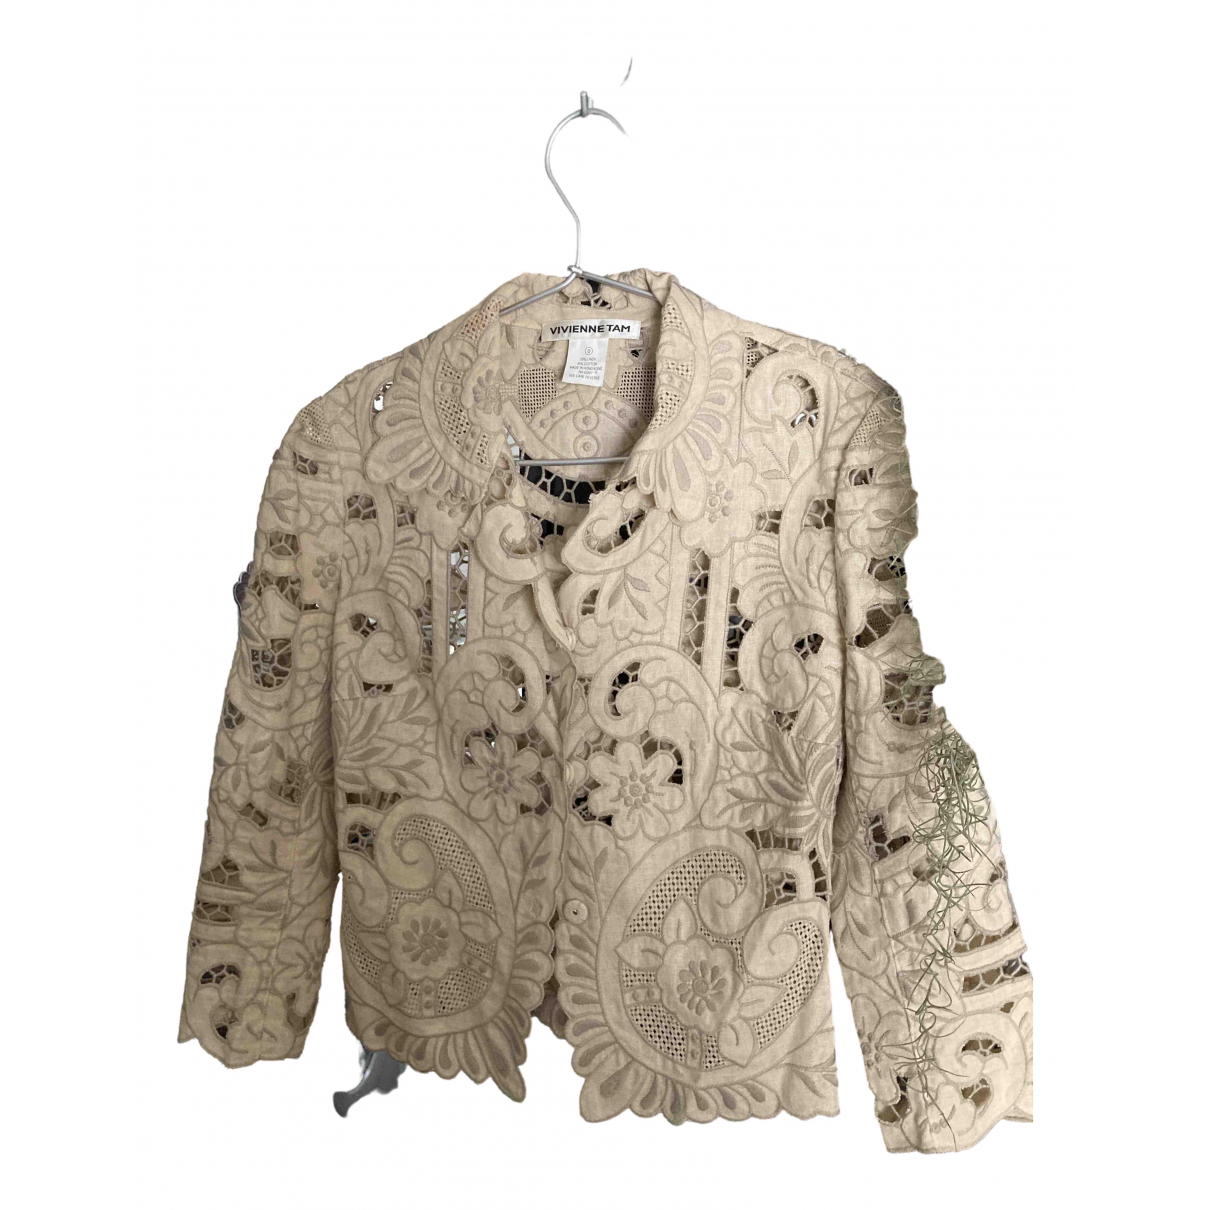 Vivienne Tam \N Beige Linen jacket for Women 0 0-5